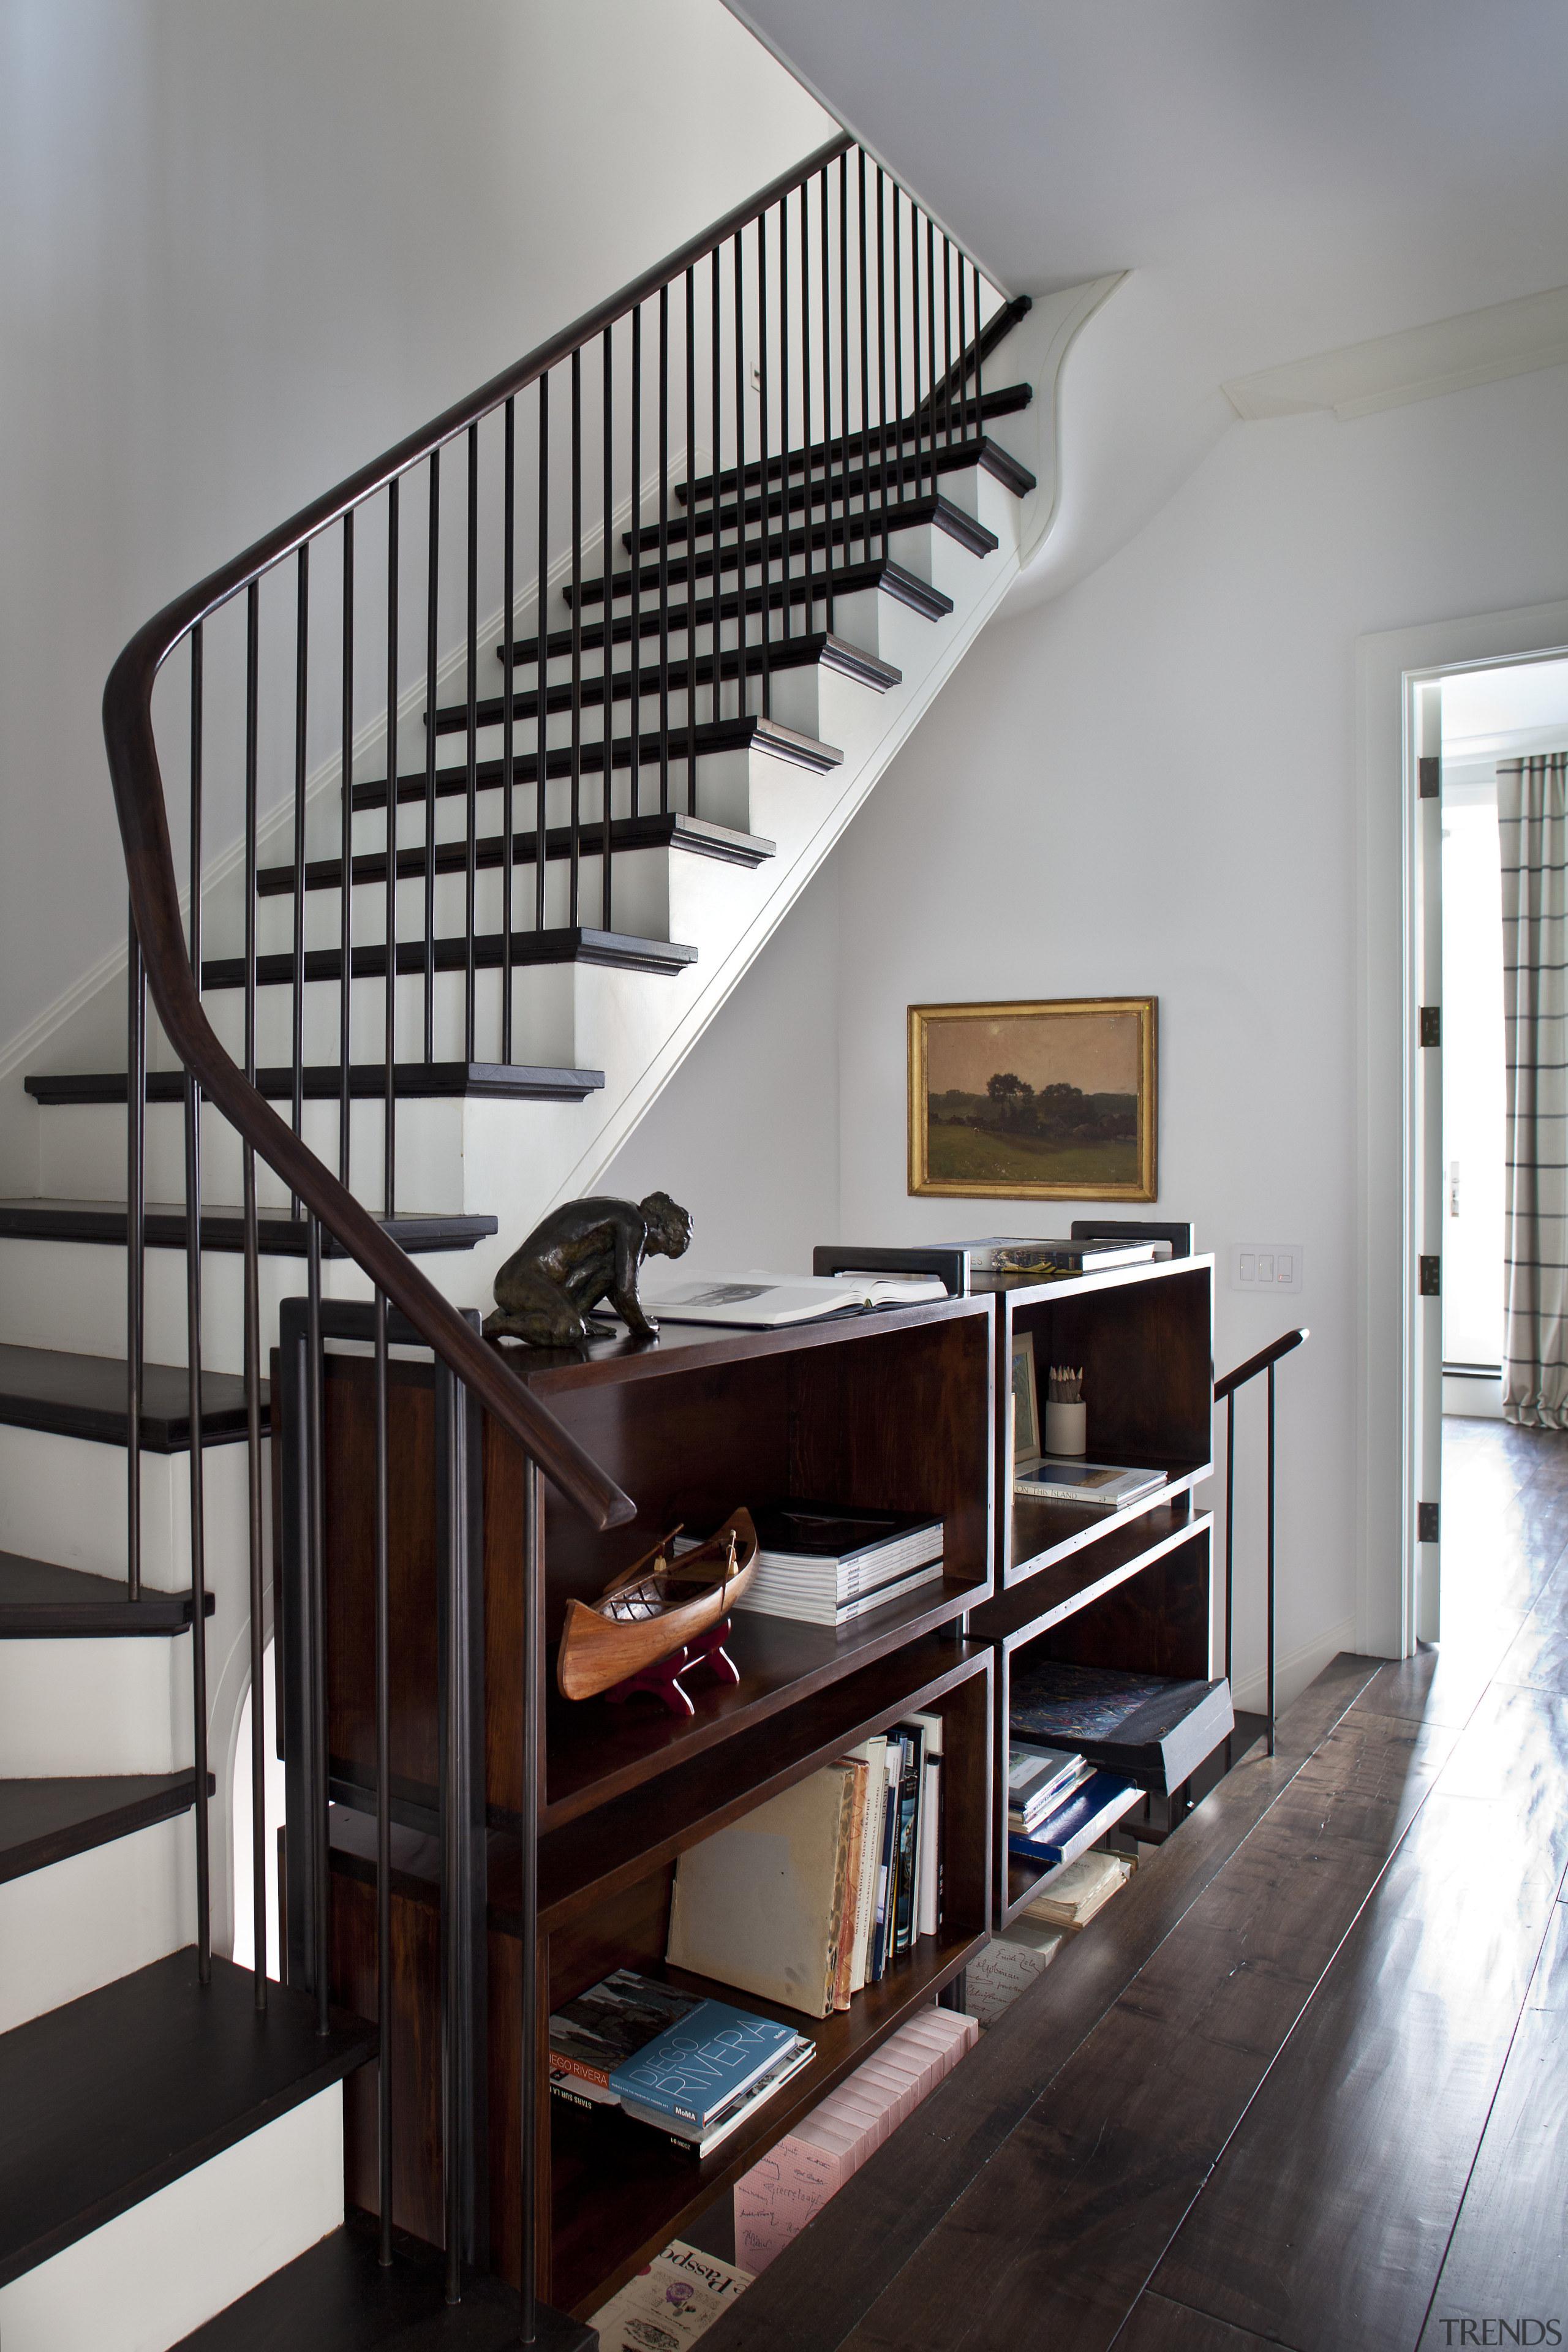 Stair in Manhattan townhouse remodel - Stair in flooring, furniture, handrail, home, interior design, shelf, shelving, stairs, gray, black